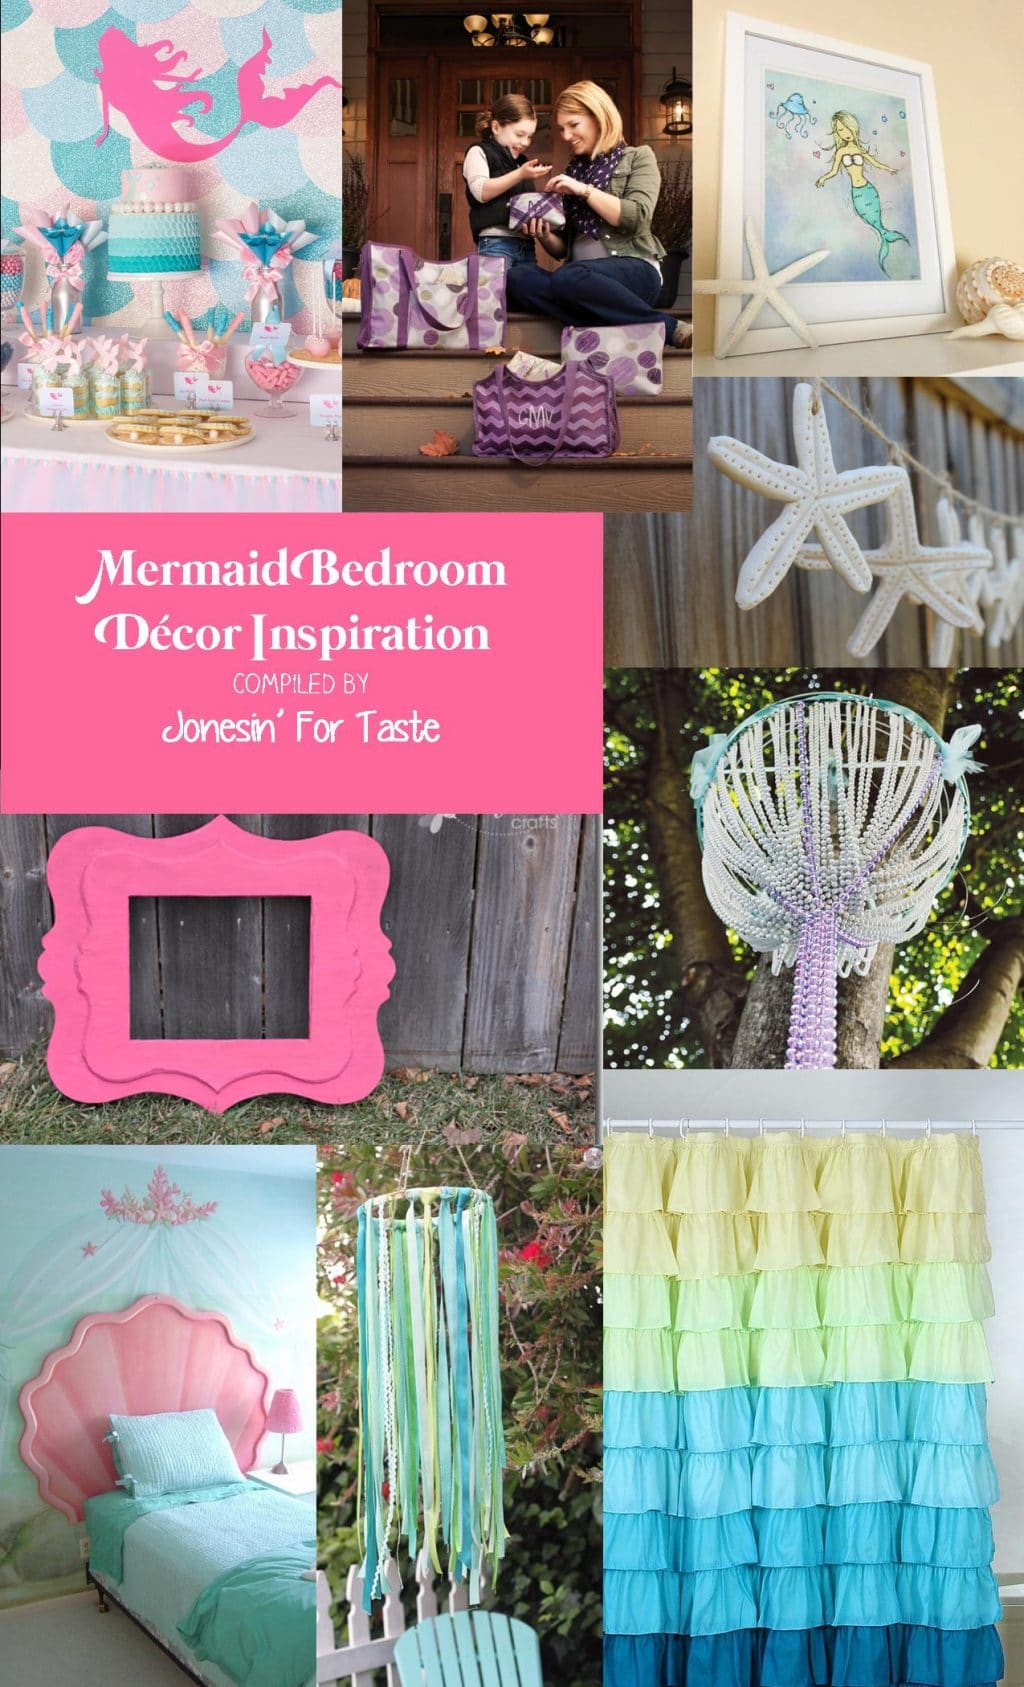 Mermaid Bedroom Inspiration